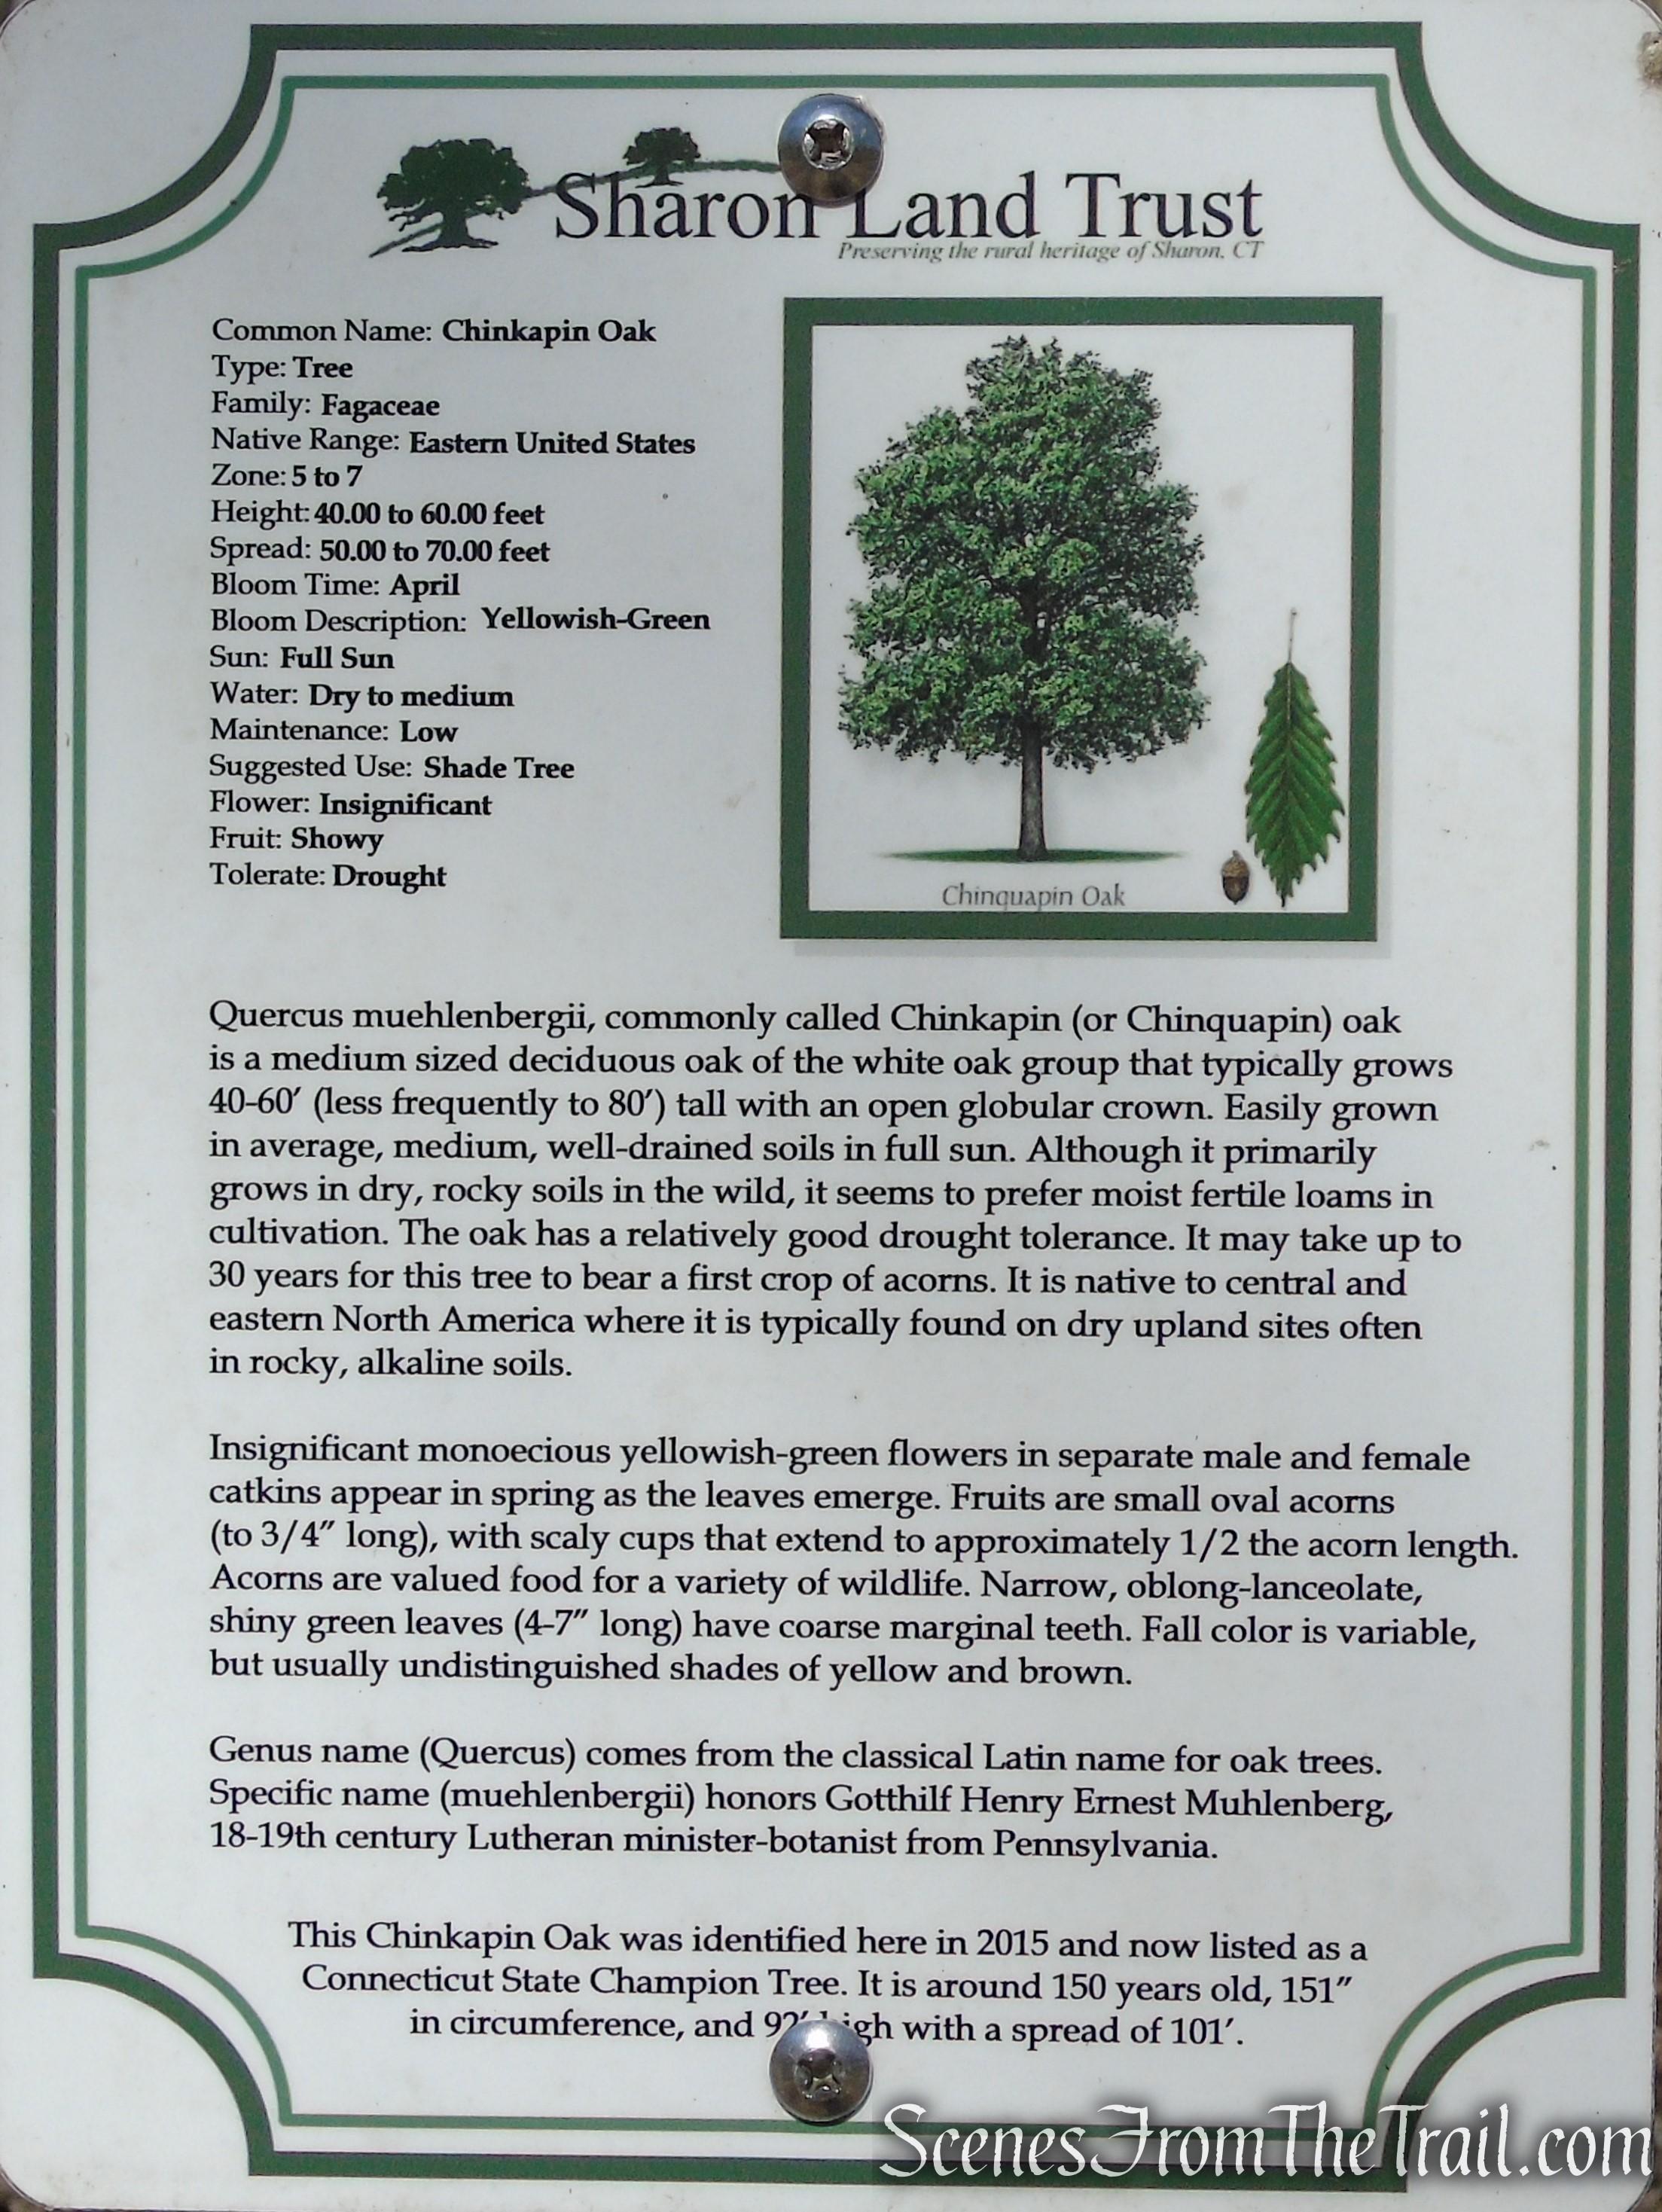 Chinkapin Oak - Sharon Land Trust